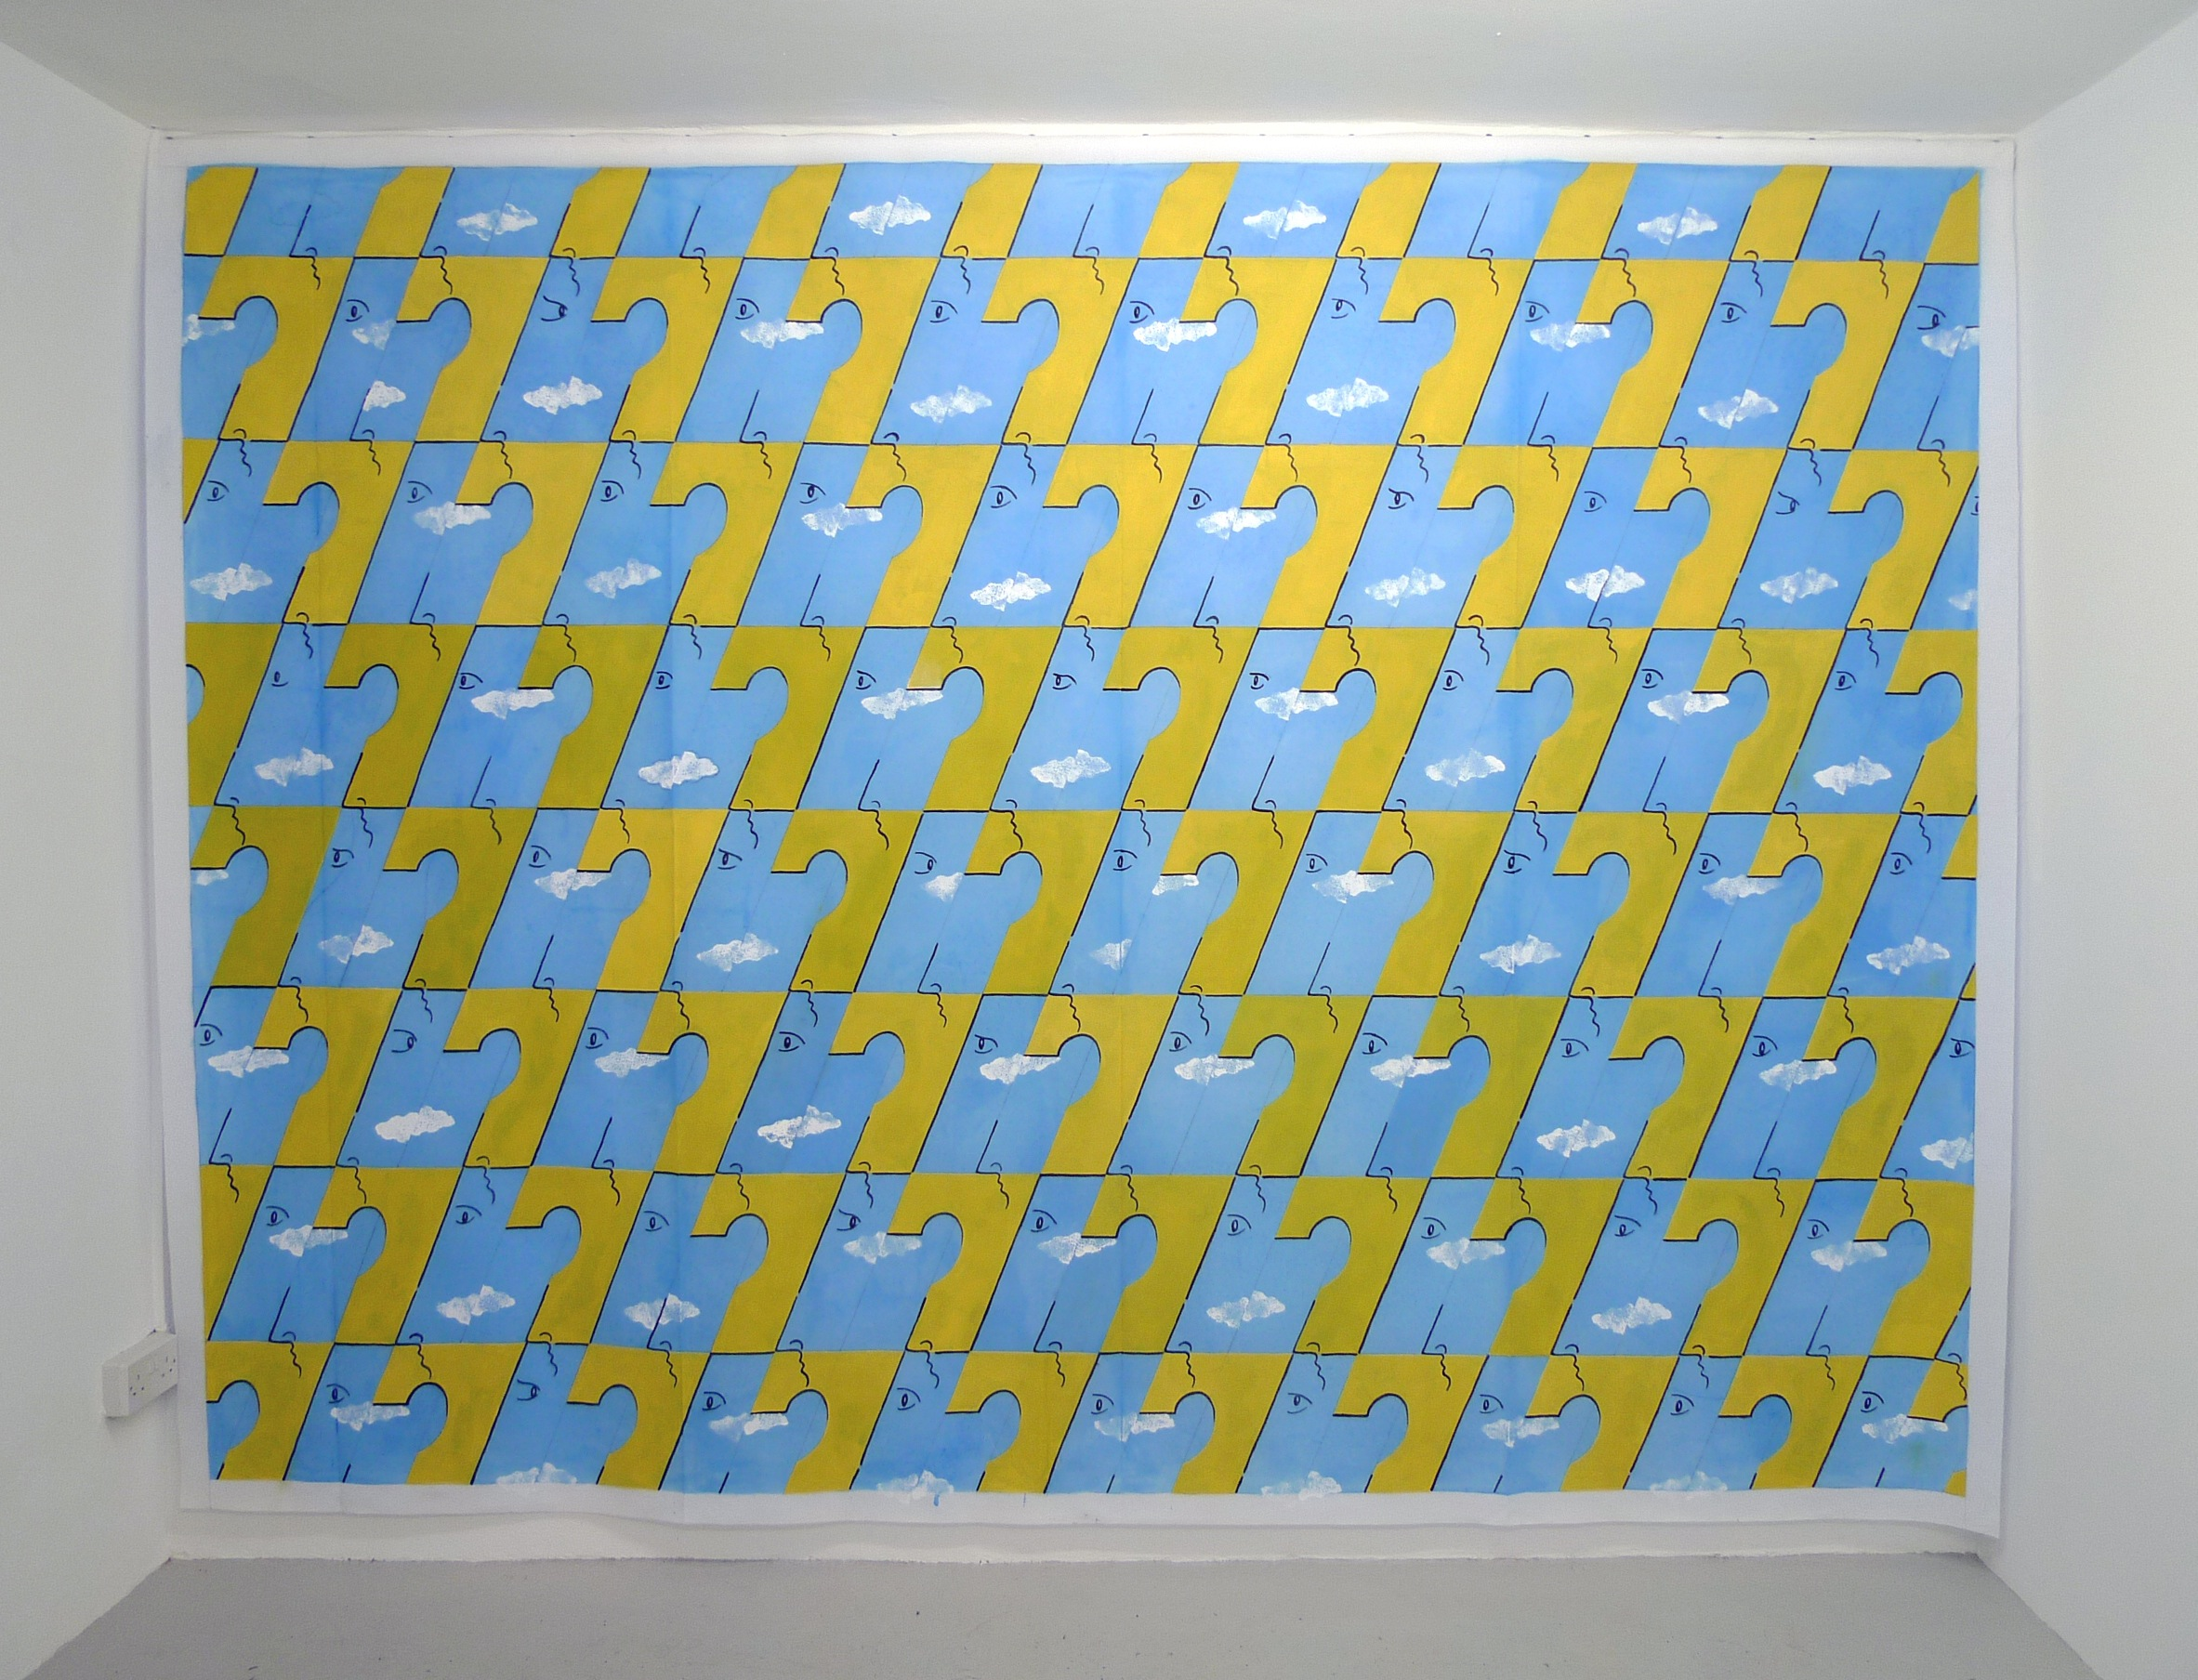 Sky Men Variations  2013 Acrylic on Scenic Polyester, 225 x 298 cm